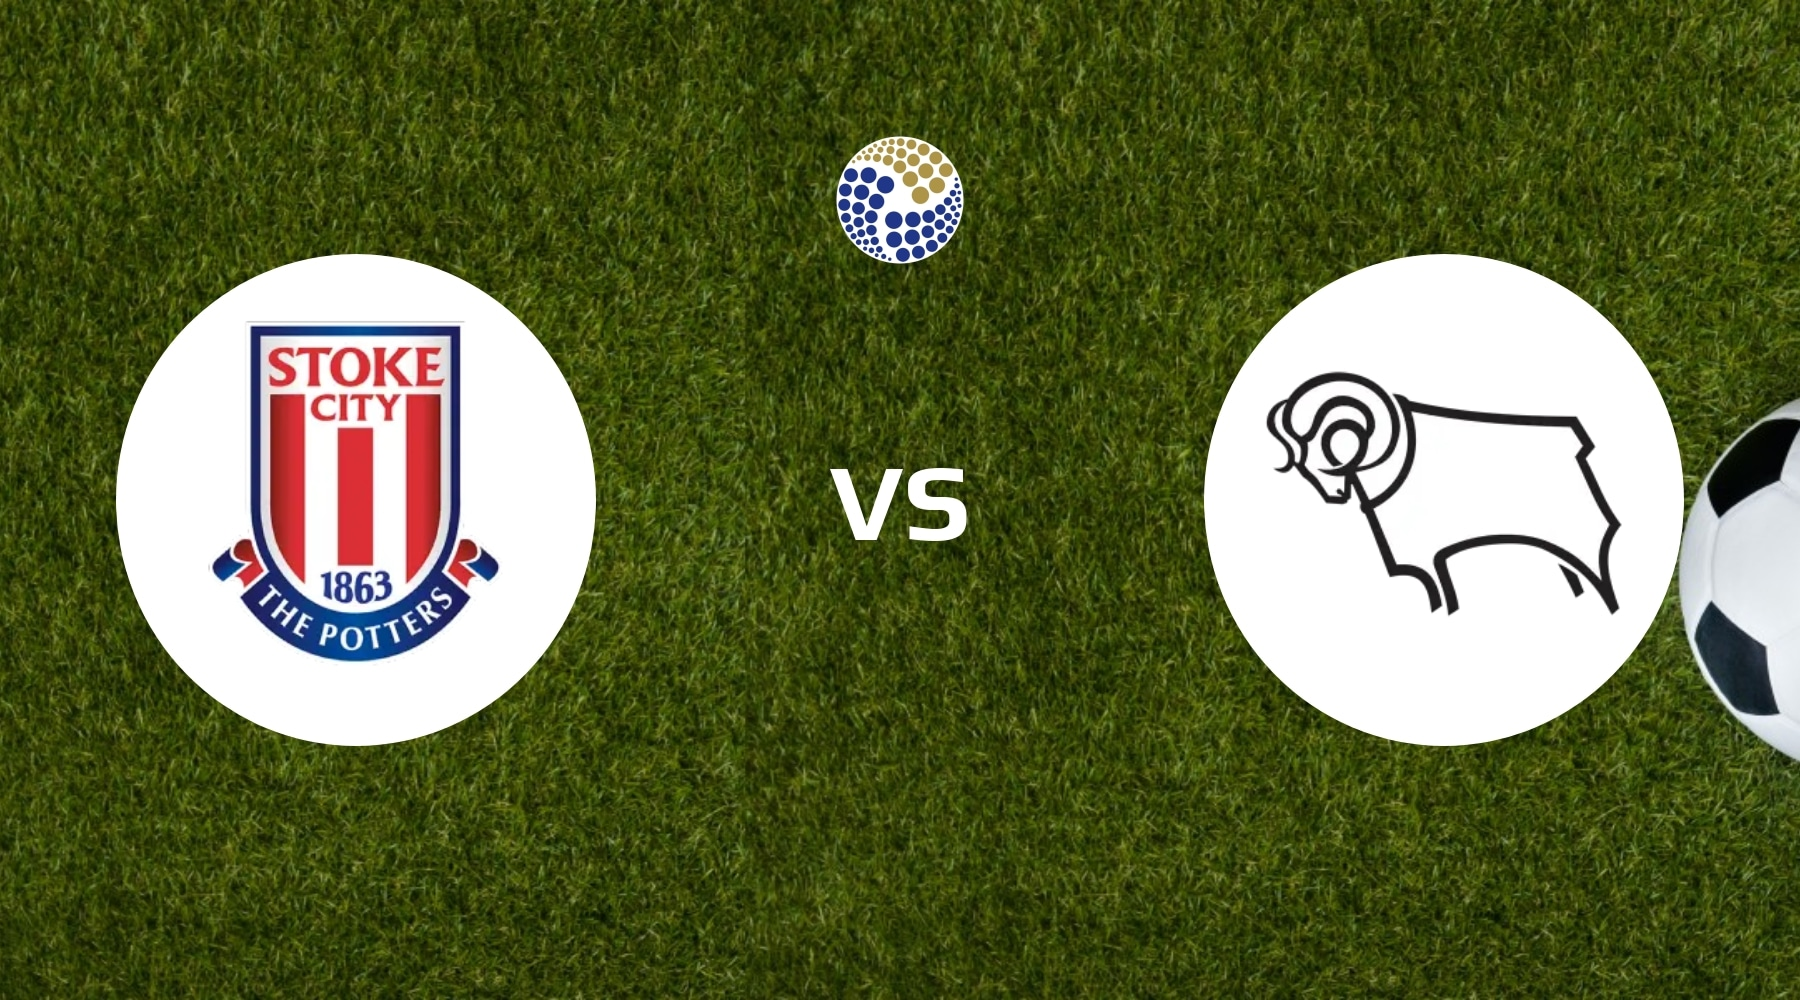 Stoke City vs Derby County Betting